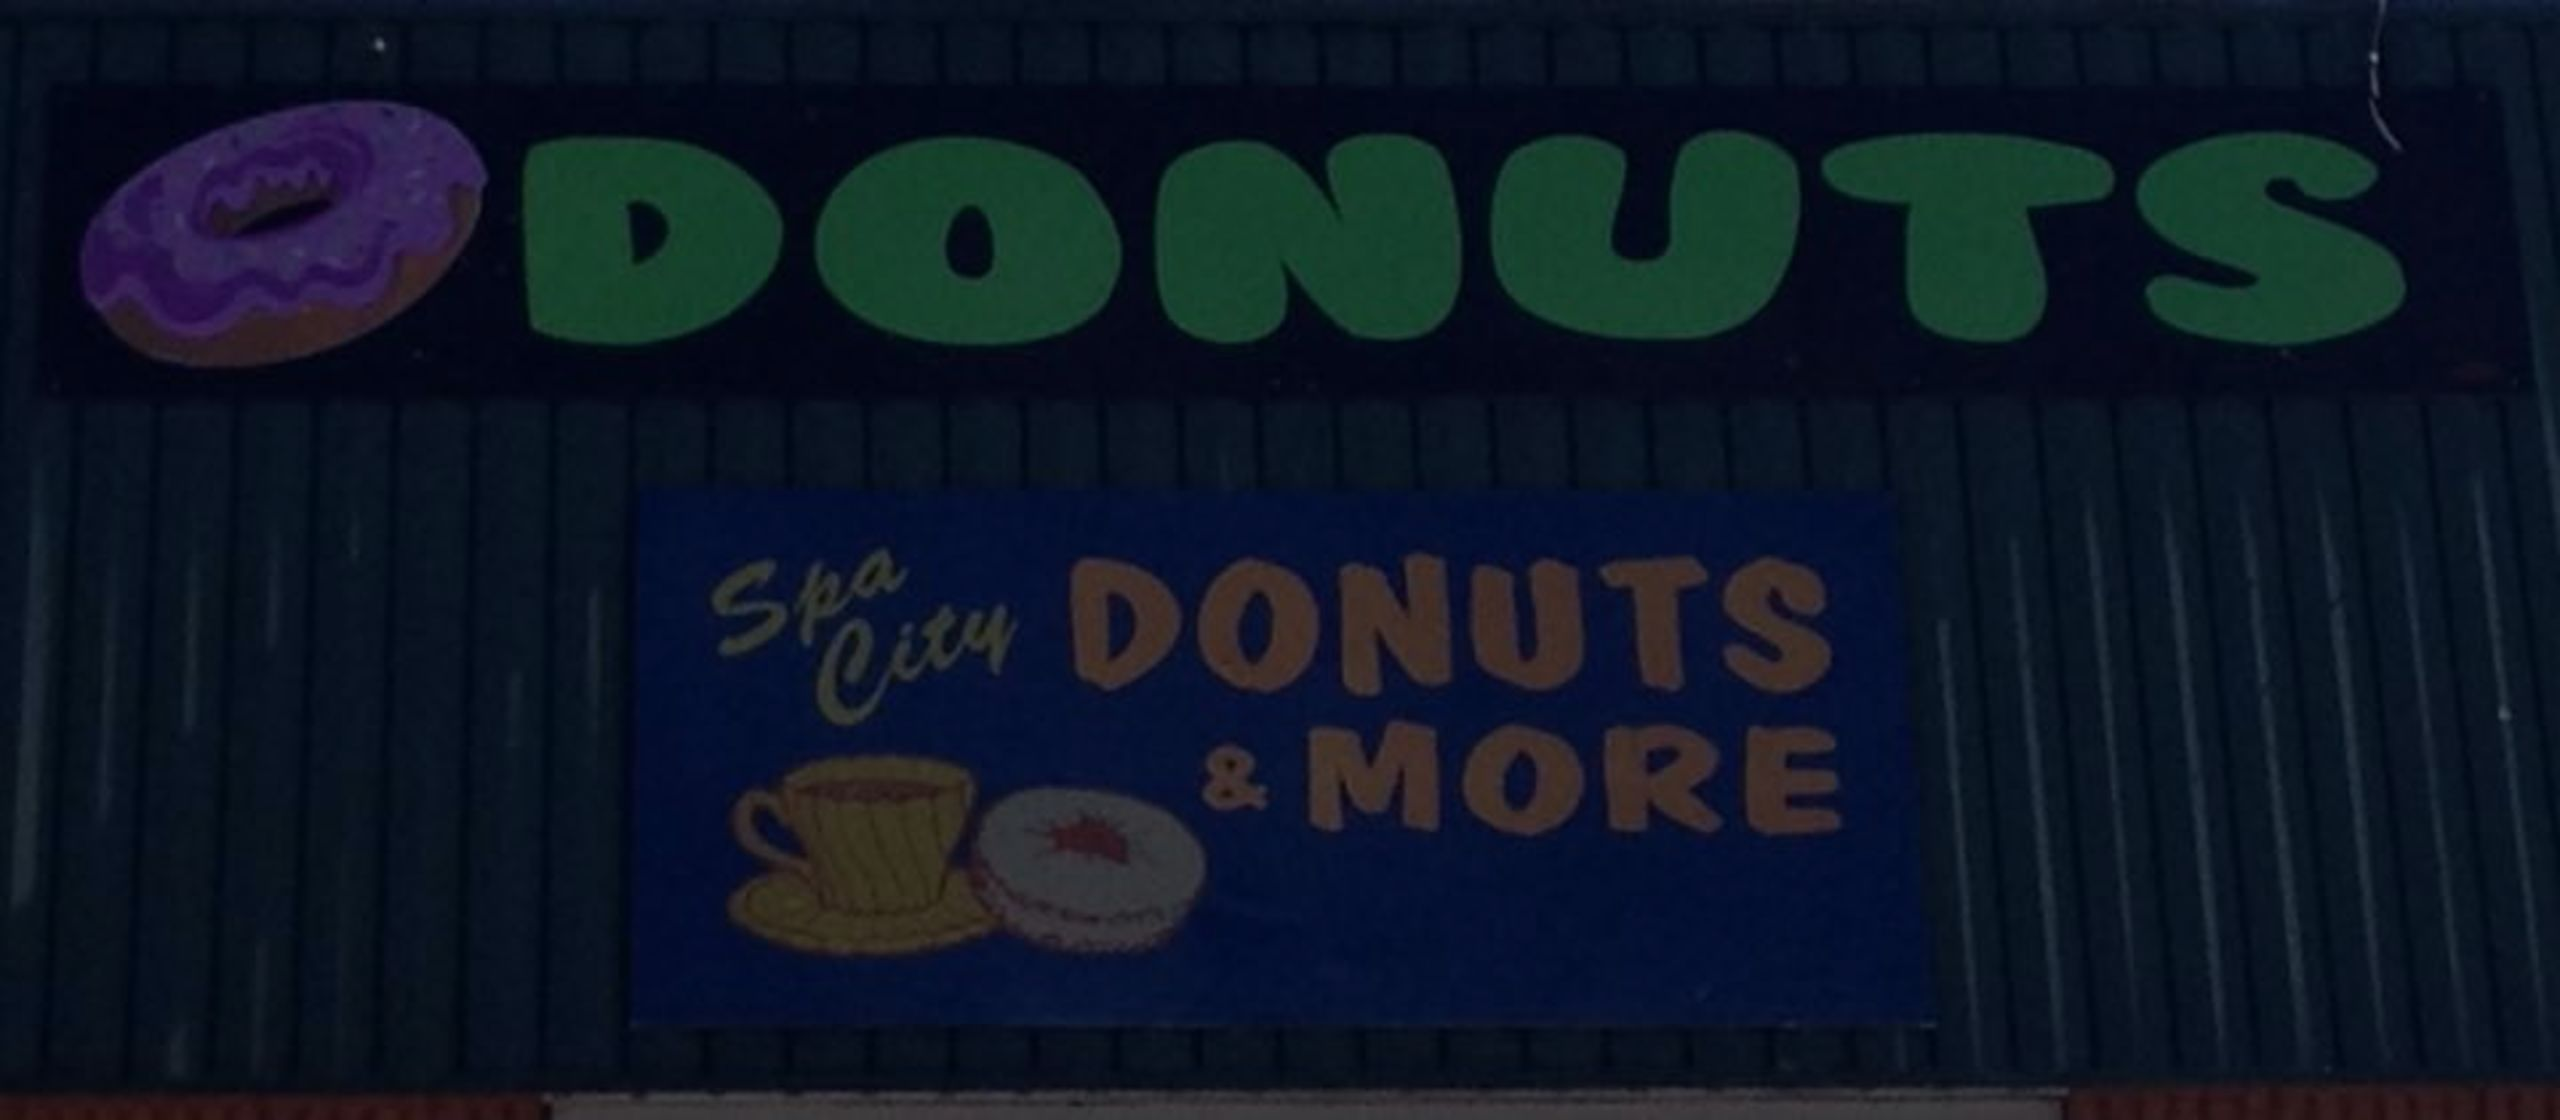 Spa City Donuts